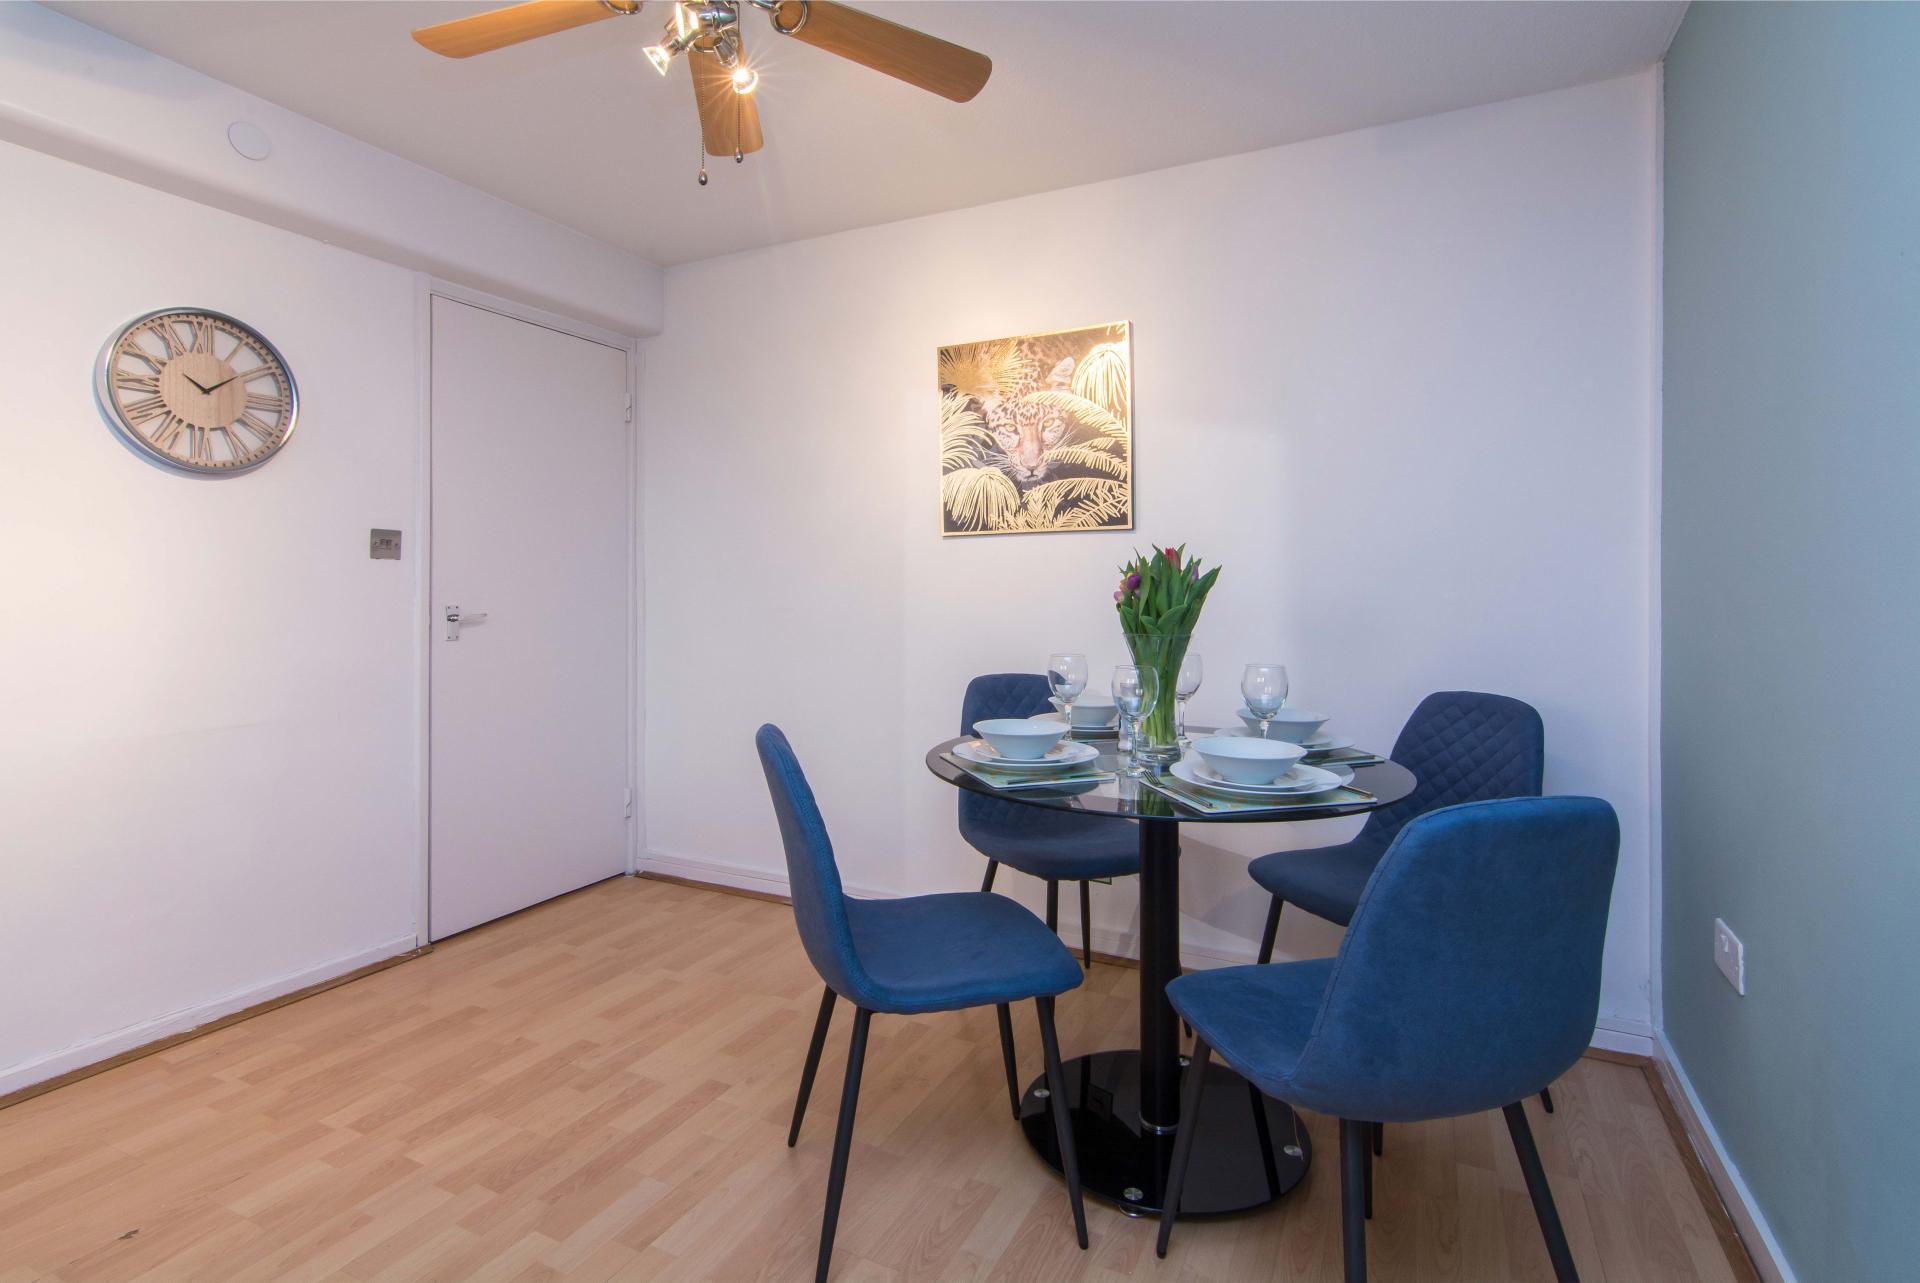 Dining area at Victoria Centre Apartment, Centre, Nottingham - Citybase Apartments